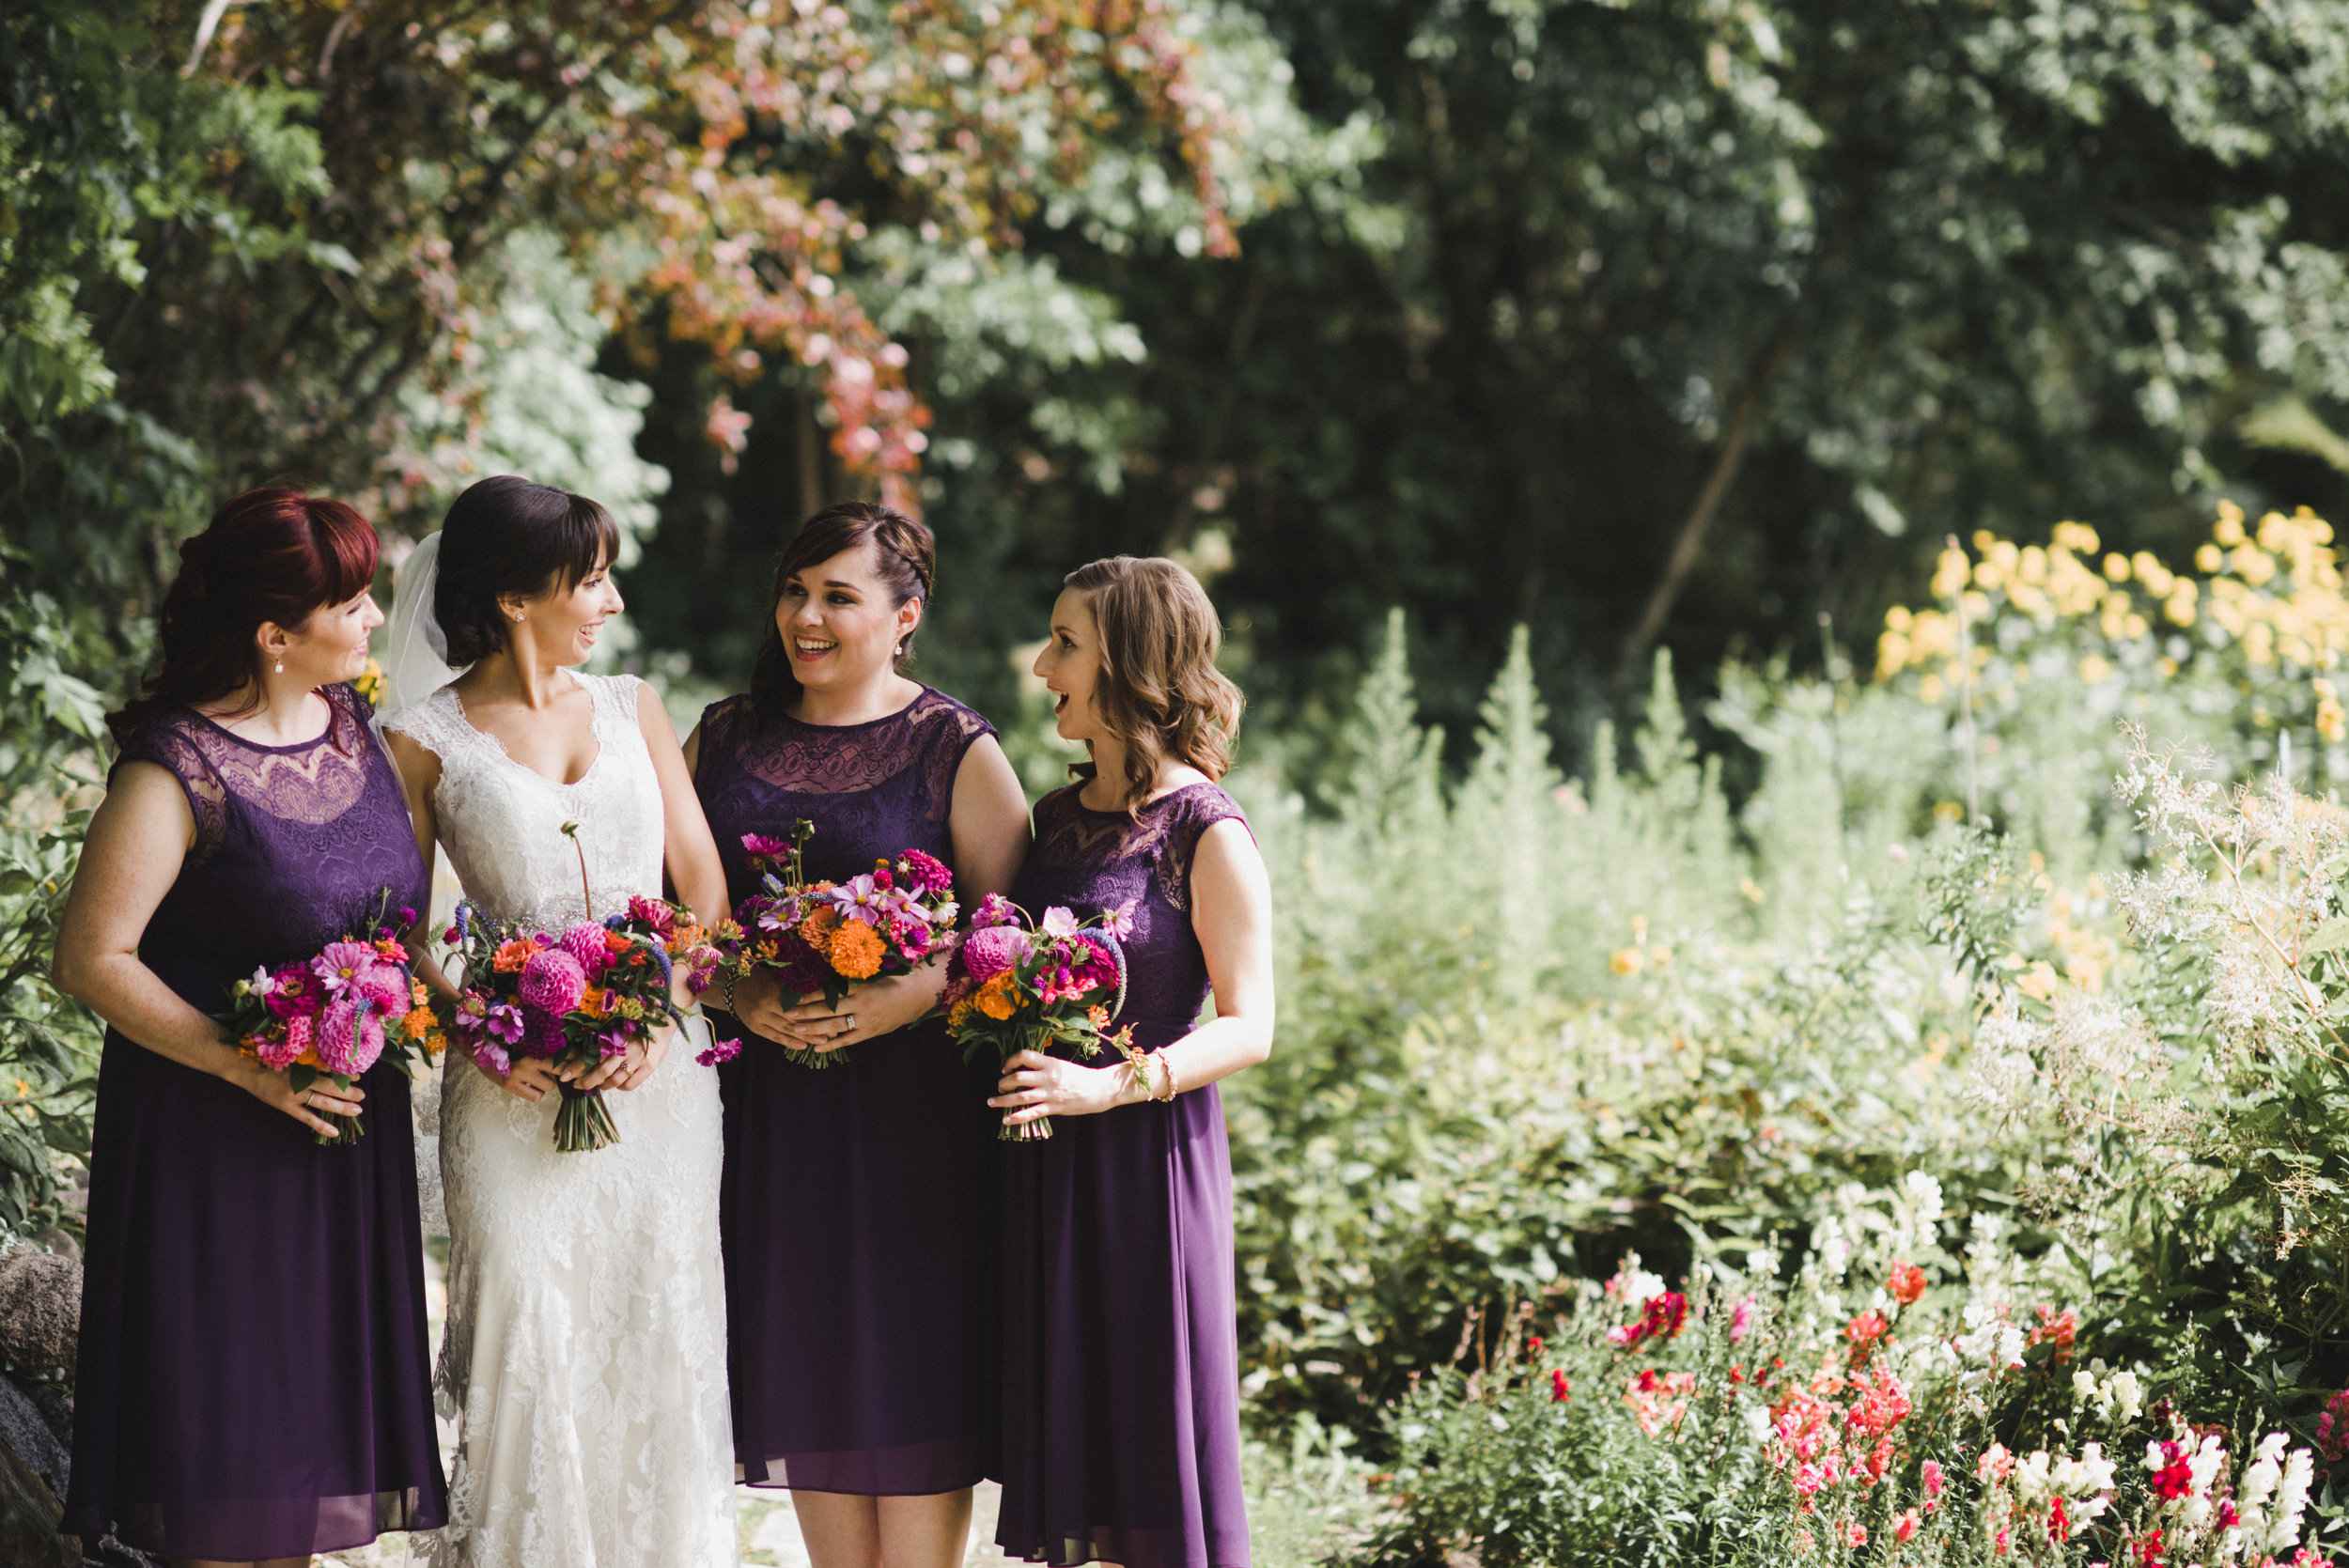 Purple Bridesmaid Dress - Colourful Wedding Ideas